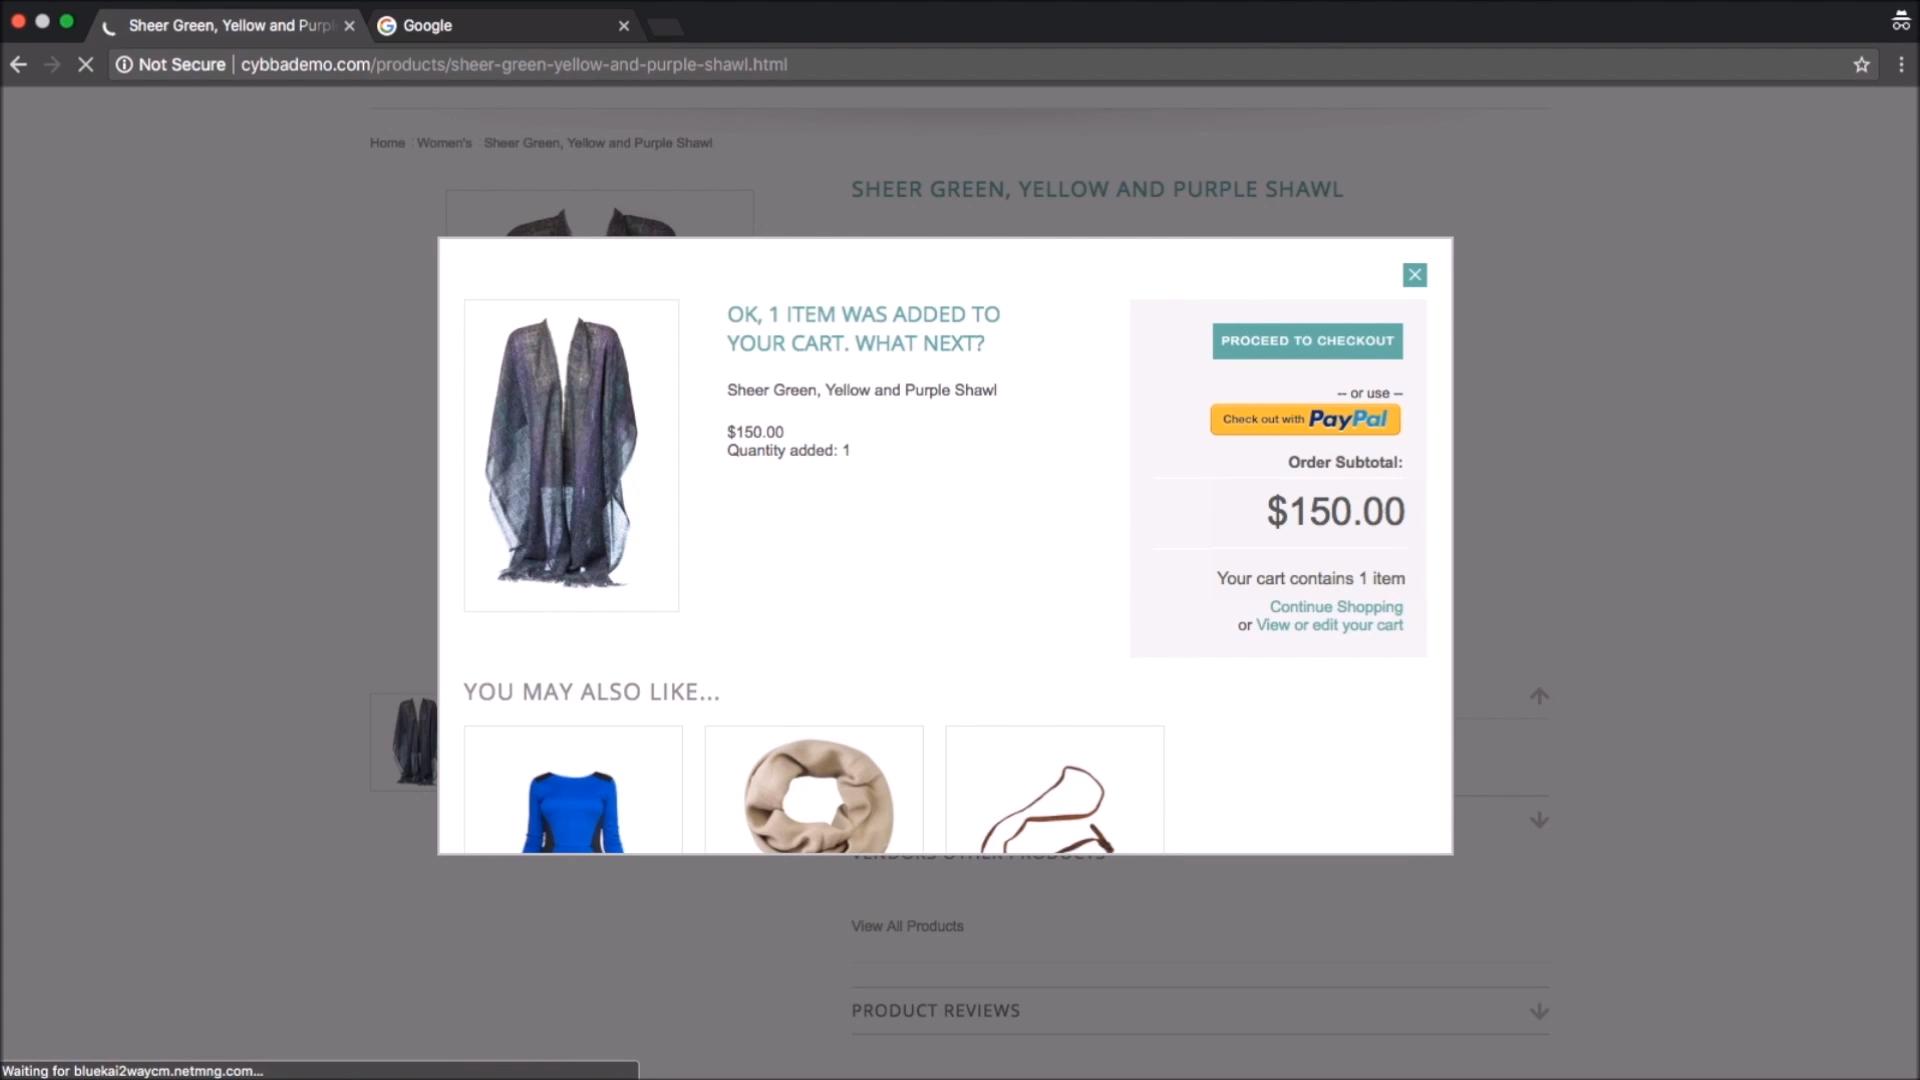 Cybba Email Remarketing shopping cart screenshot